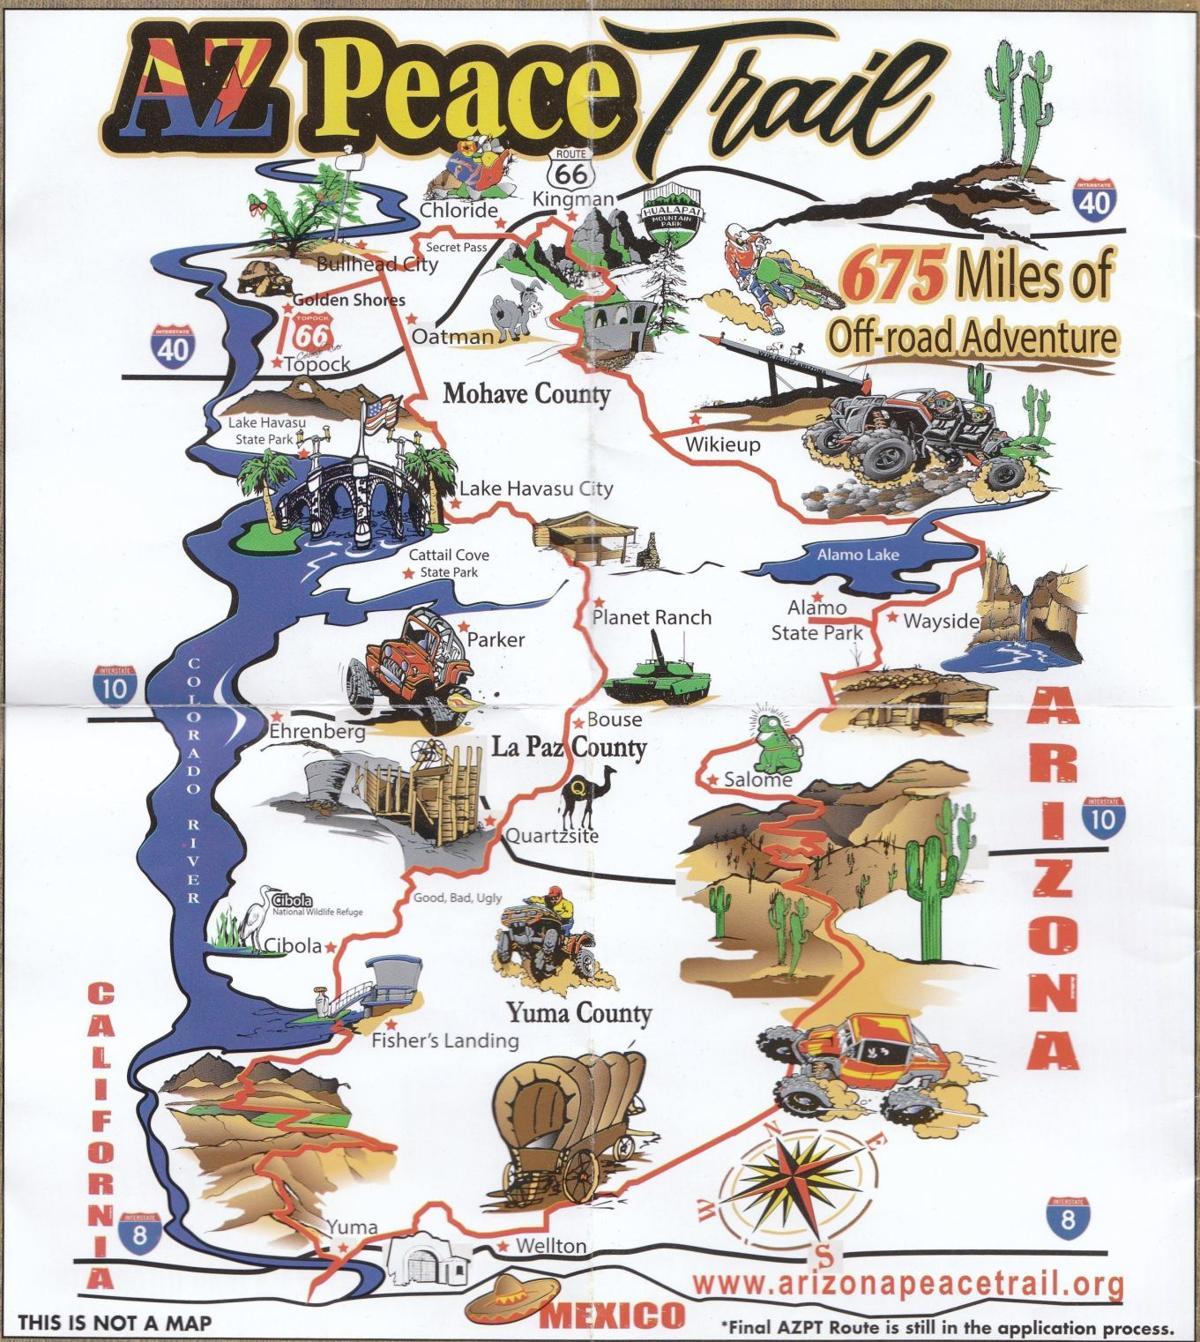 Presentation describes riding the Arizona Peace Trail | News ...